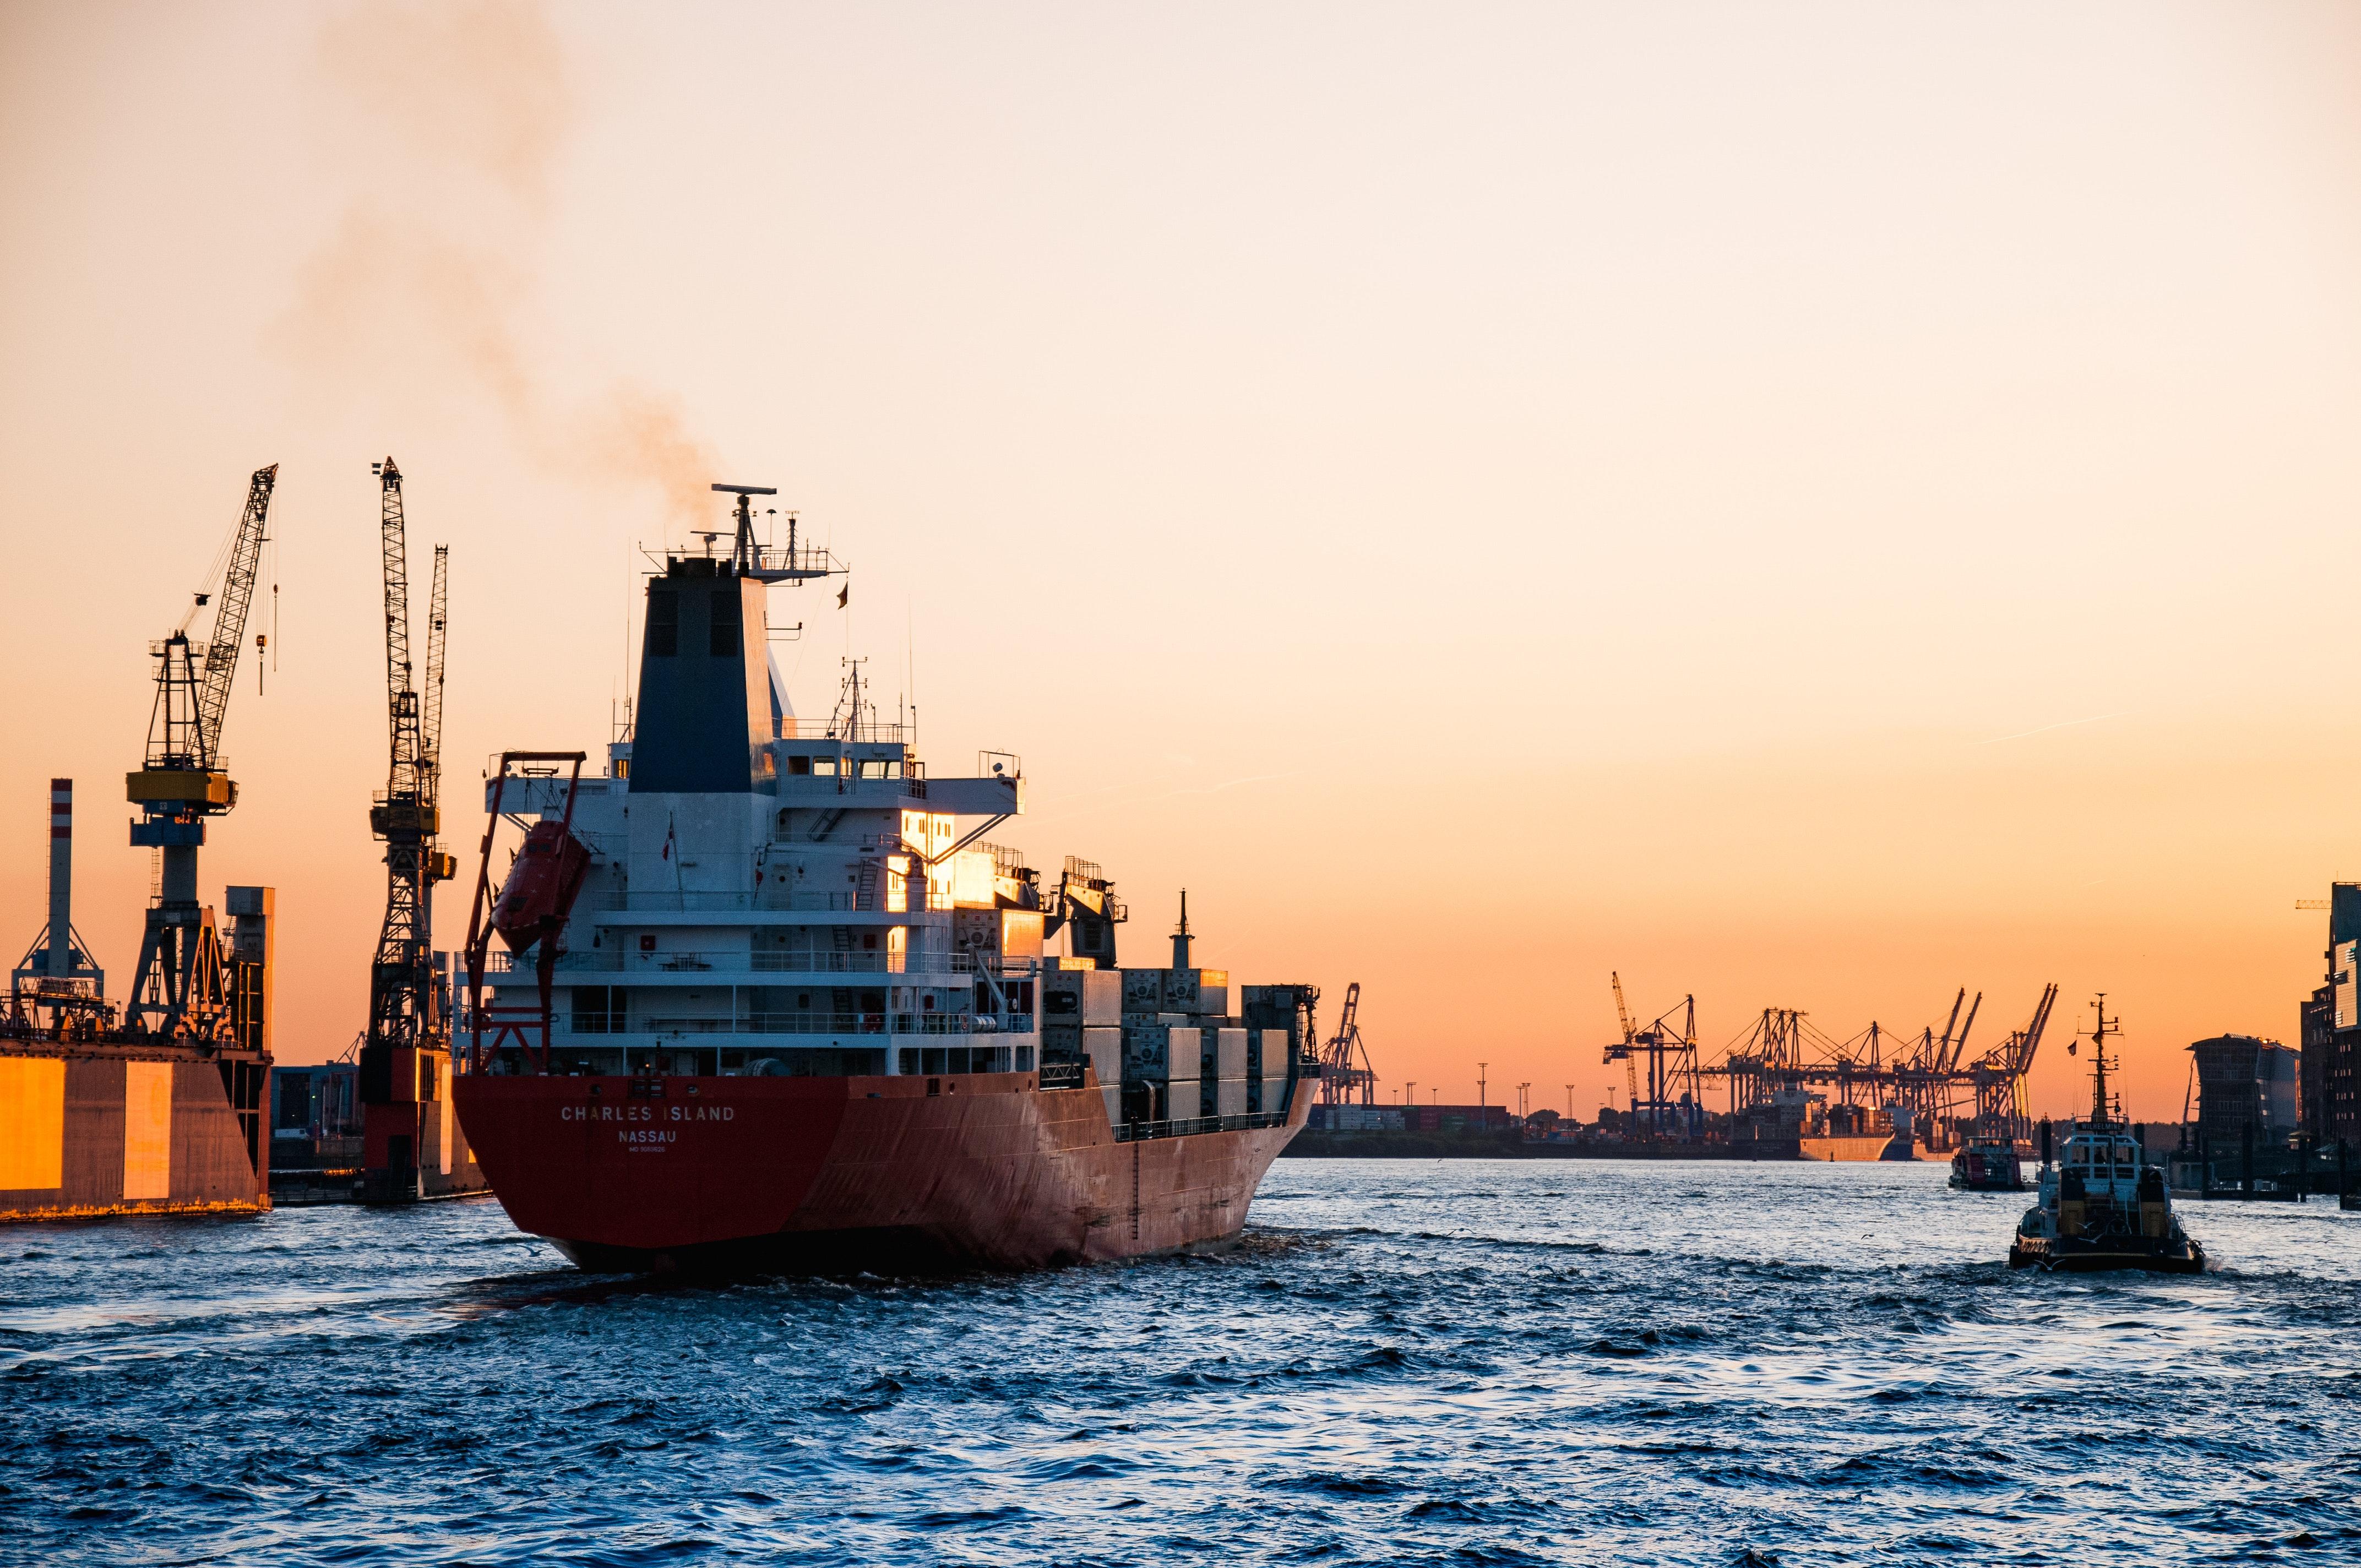 Photography of Ship, Architecture, Sea, Seashore, Ship, HQ Photo